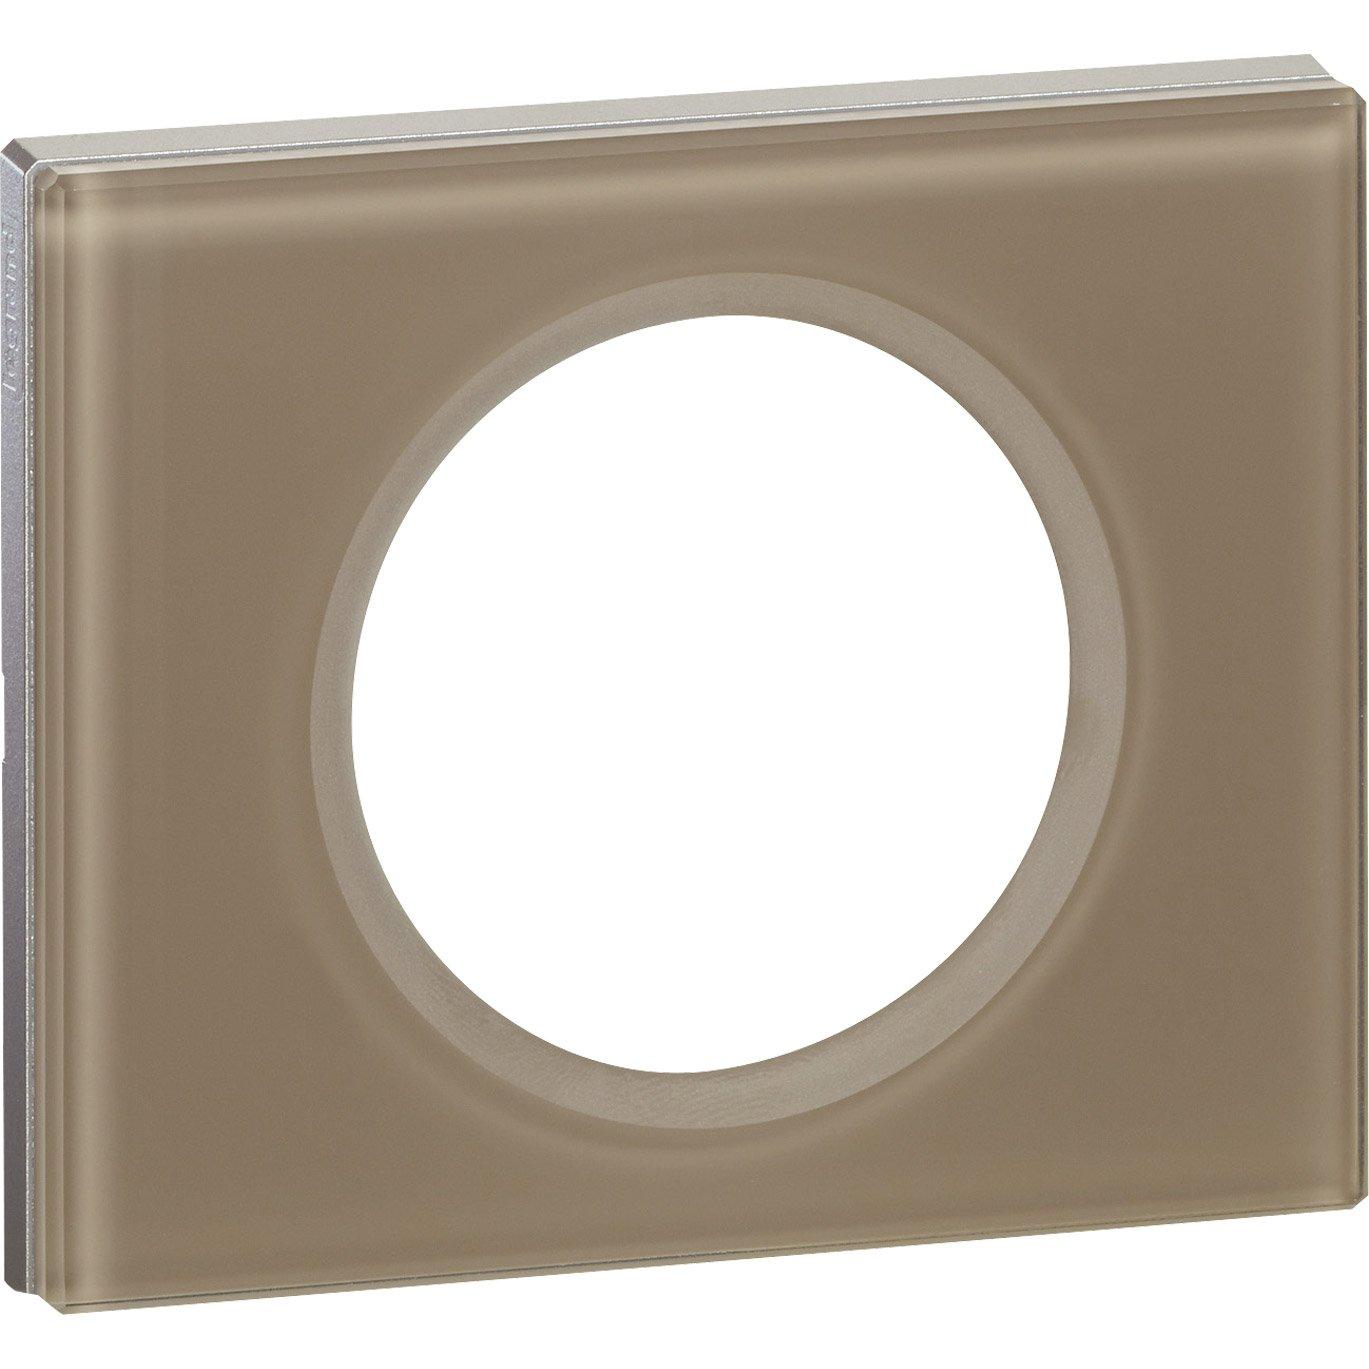 plaque c liane legrand moka brillant leroy merlin. Black Bedroom Furniture Sets. Home Design Ideas